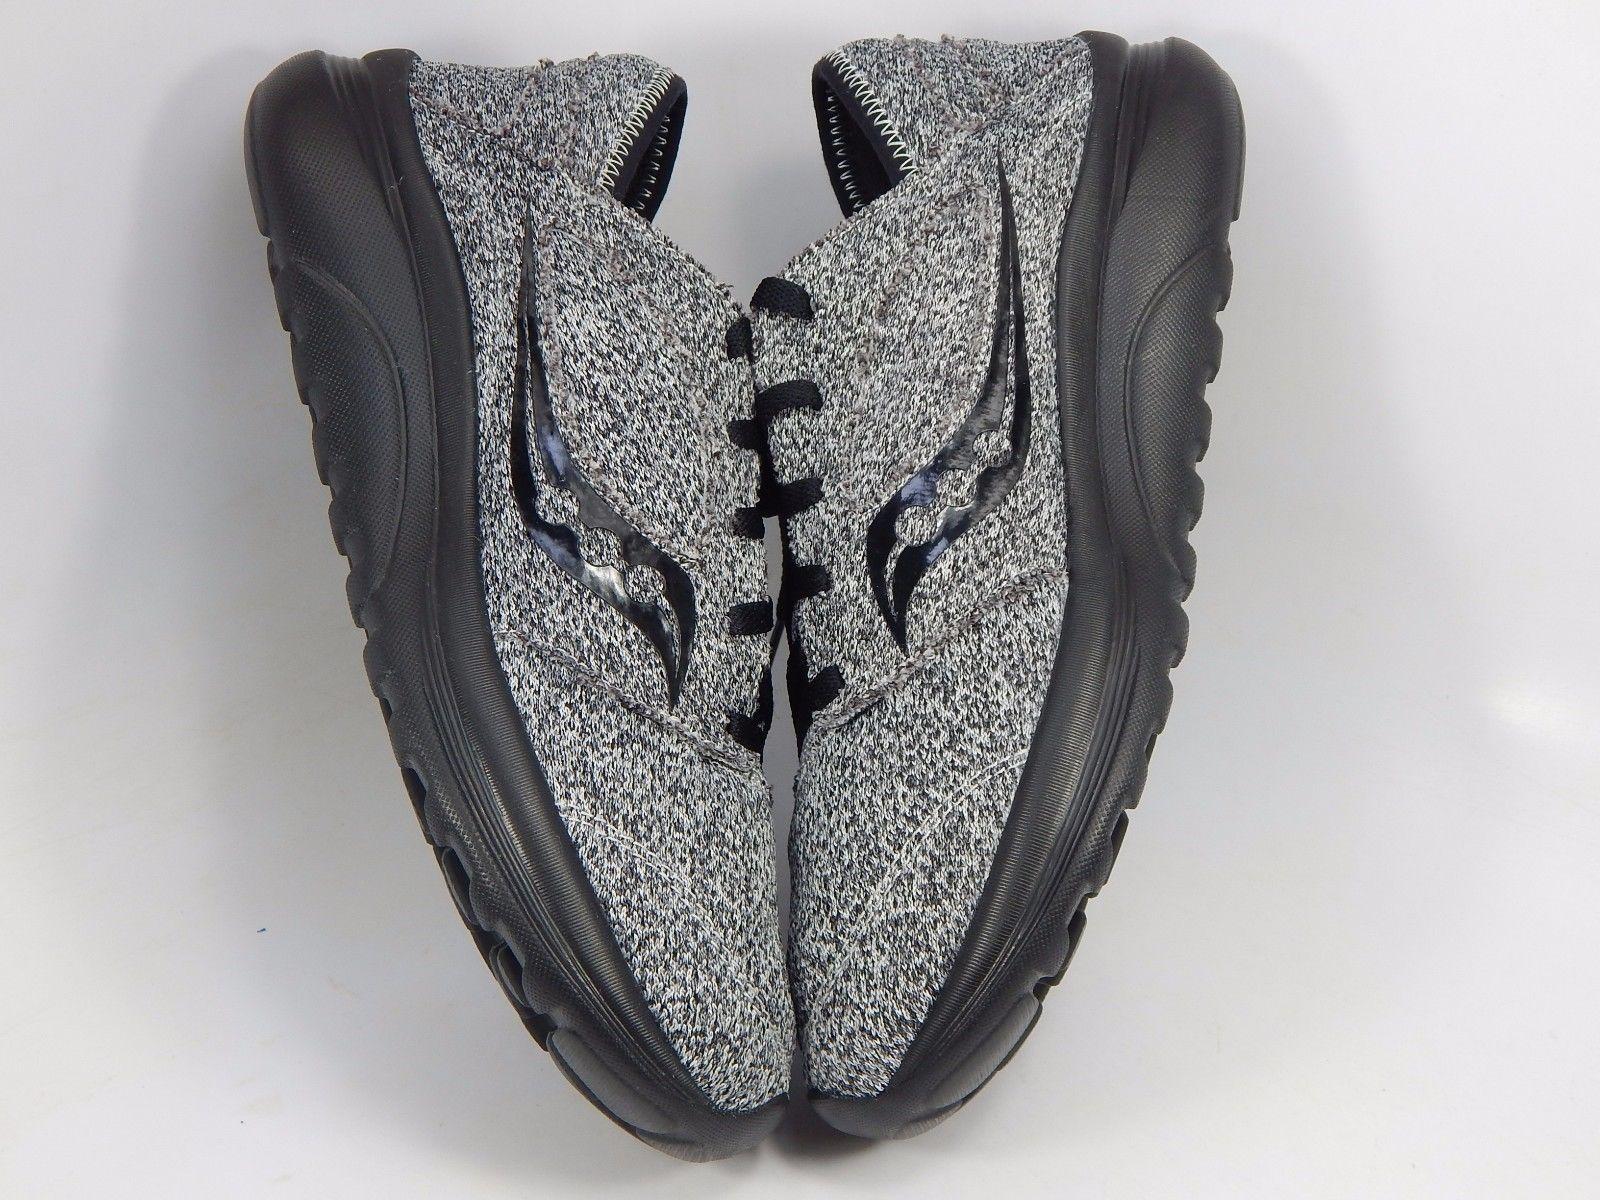 Saucony Kineta Relay Men's Running Shoes Size US 9 M (D) EU 42.5 Marl S25244-14